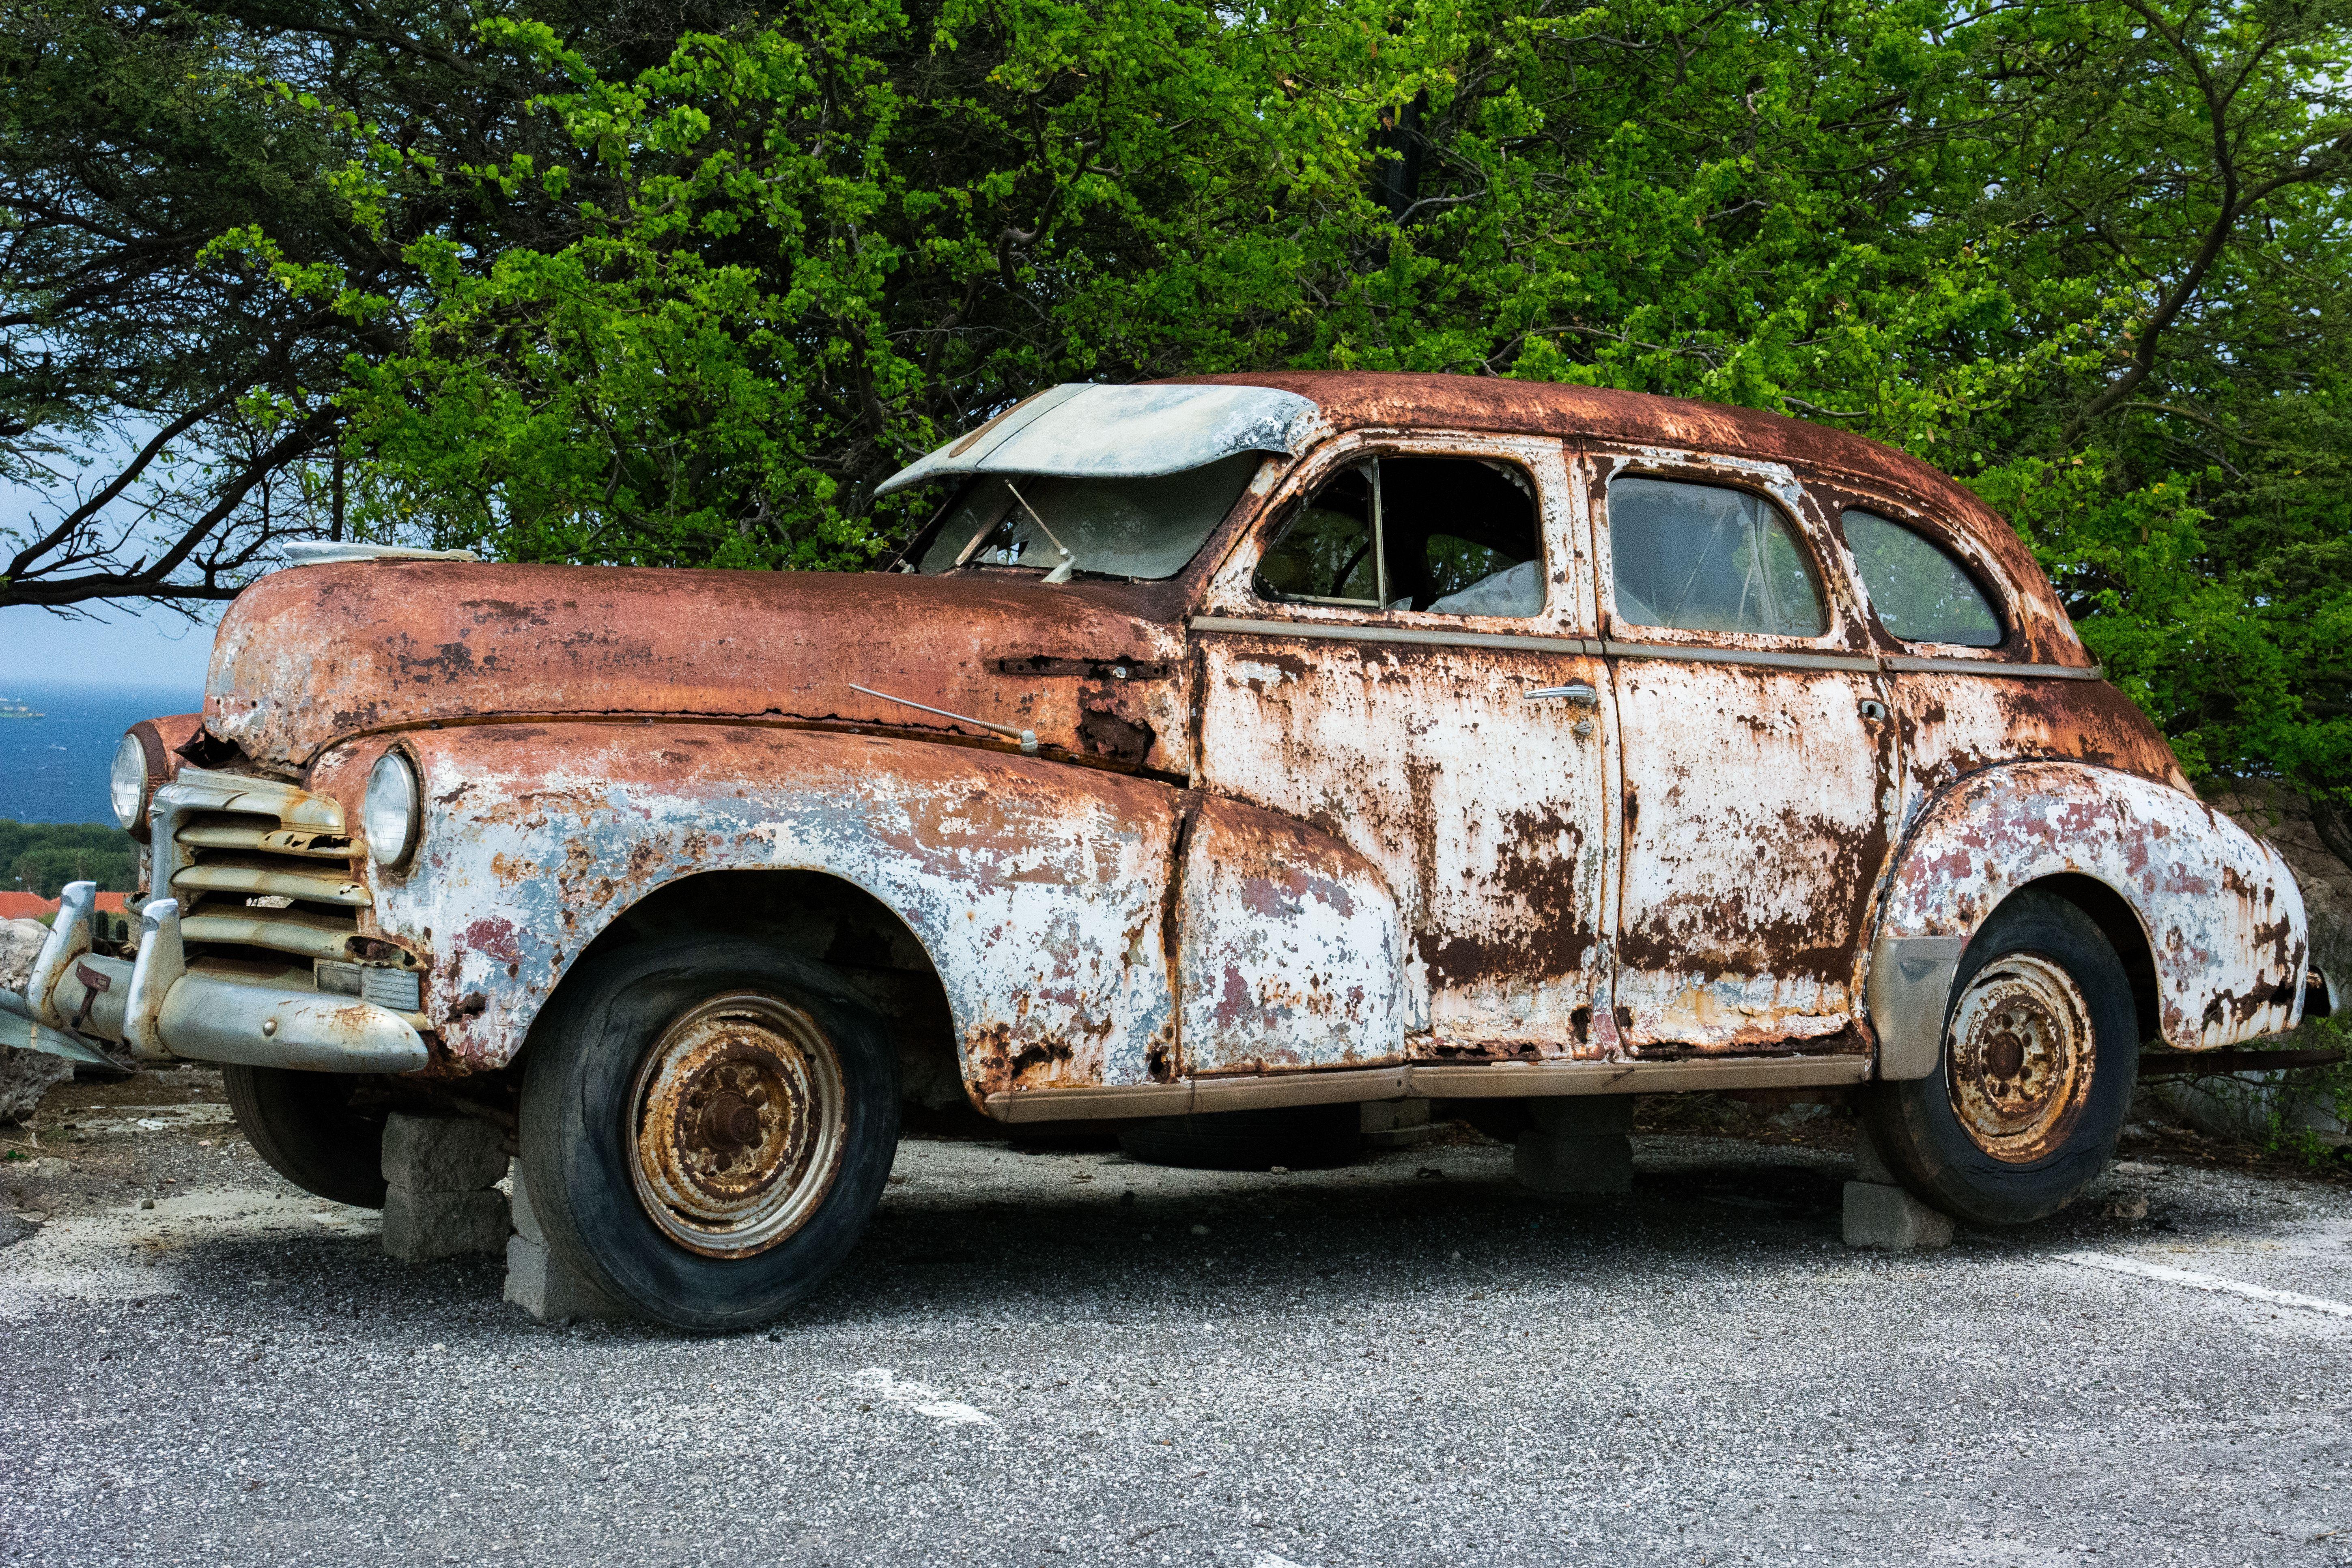 https://static.pexels.com/photos/2071/broken-car-vehicle-vintage ...